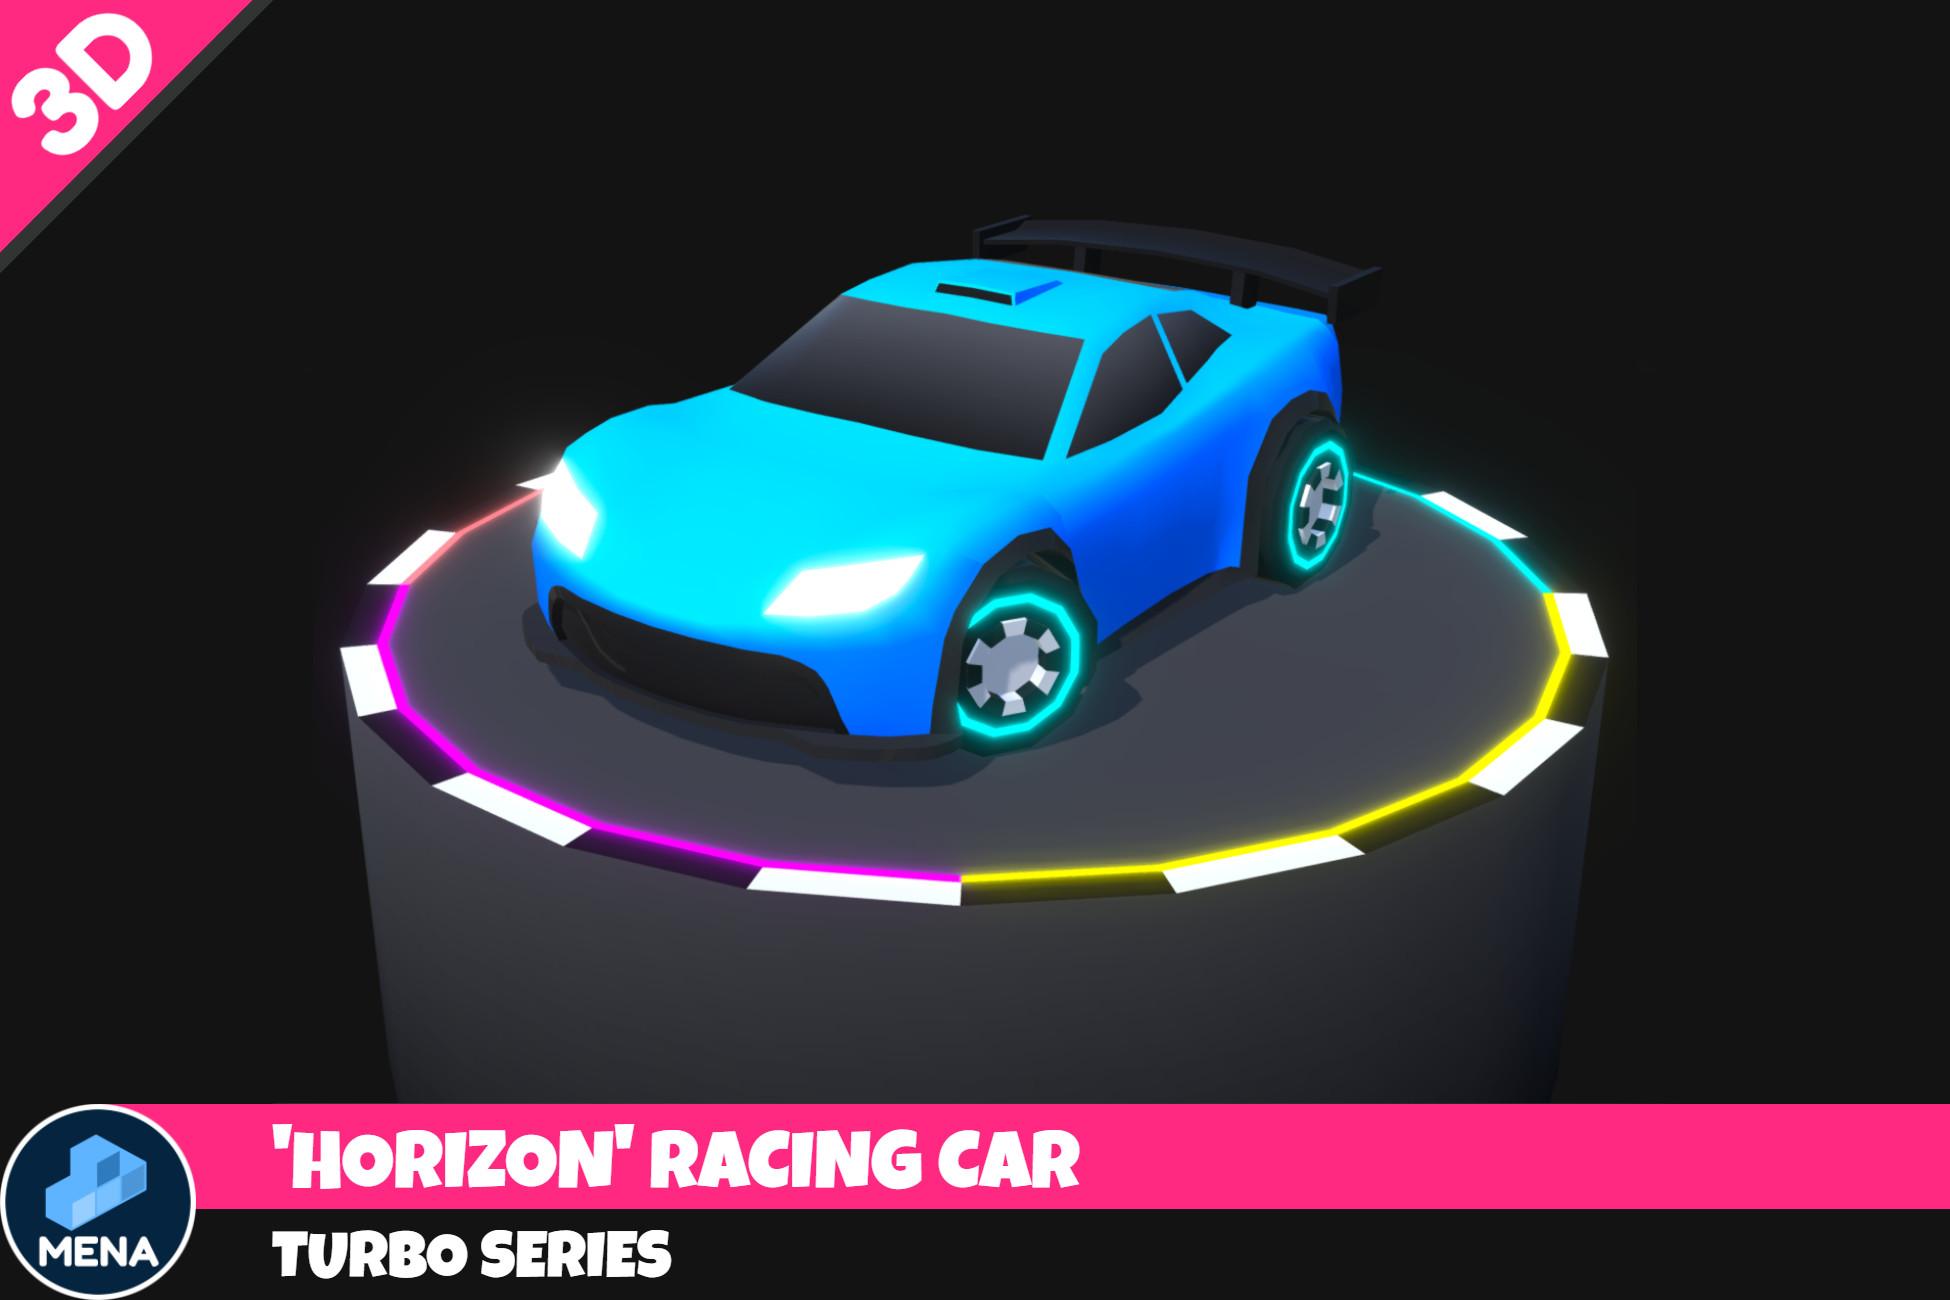 TURBO - 'Horizon' Racing Car